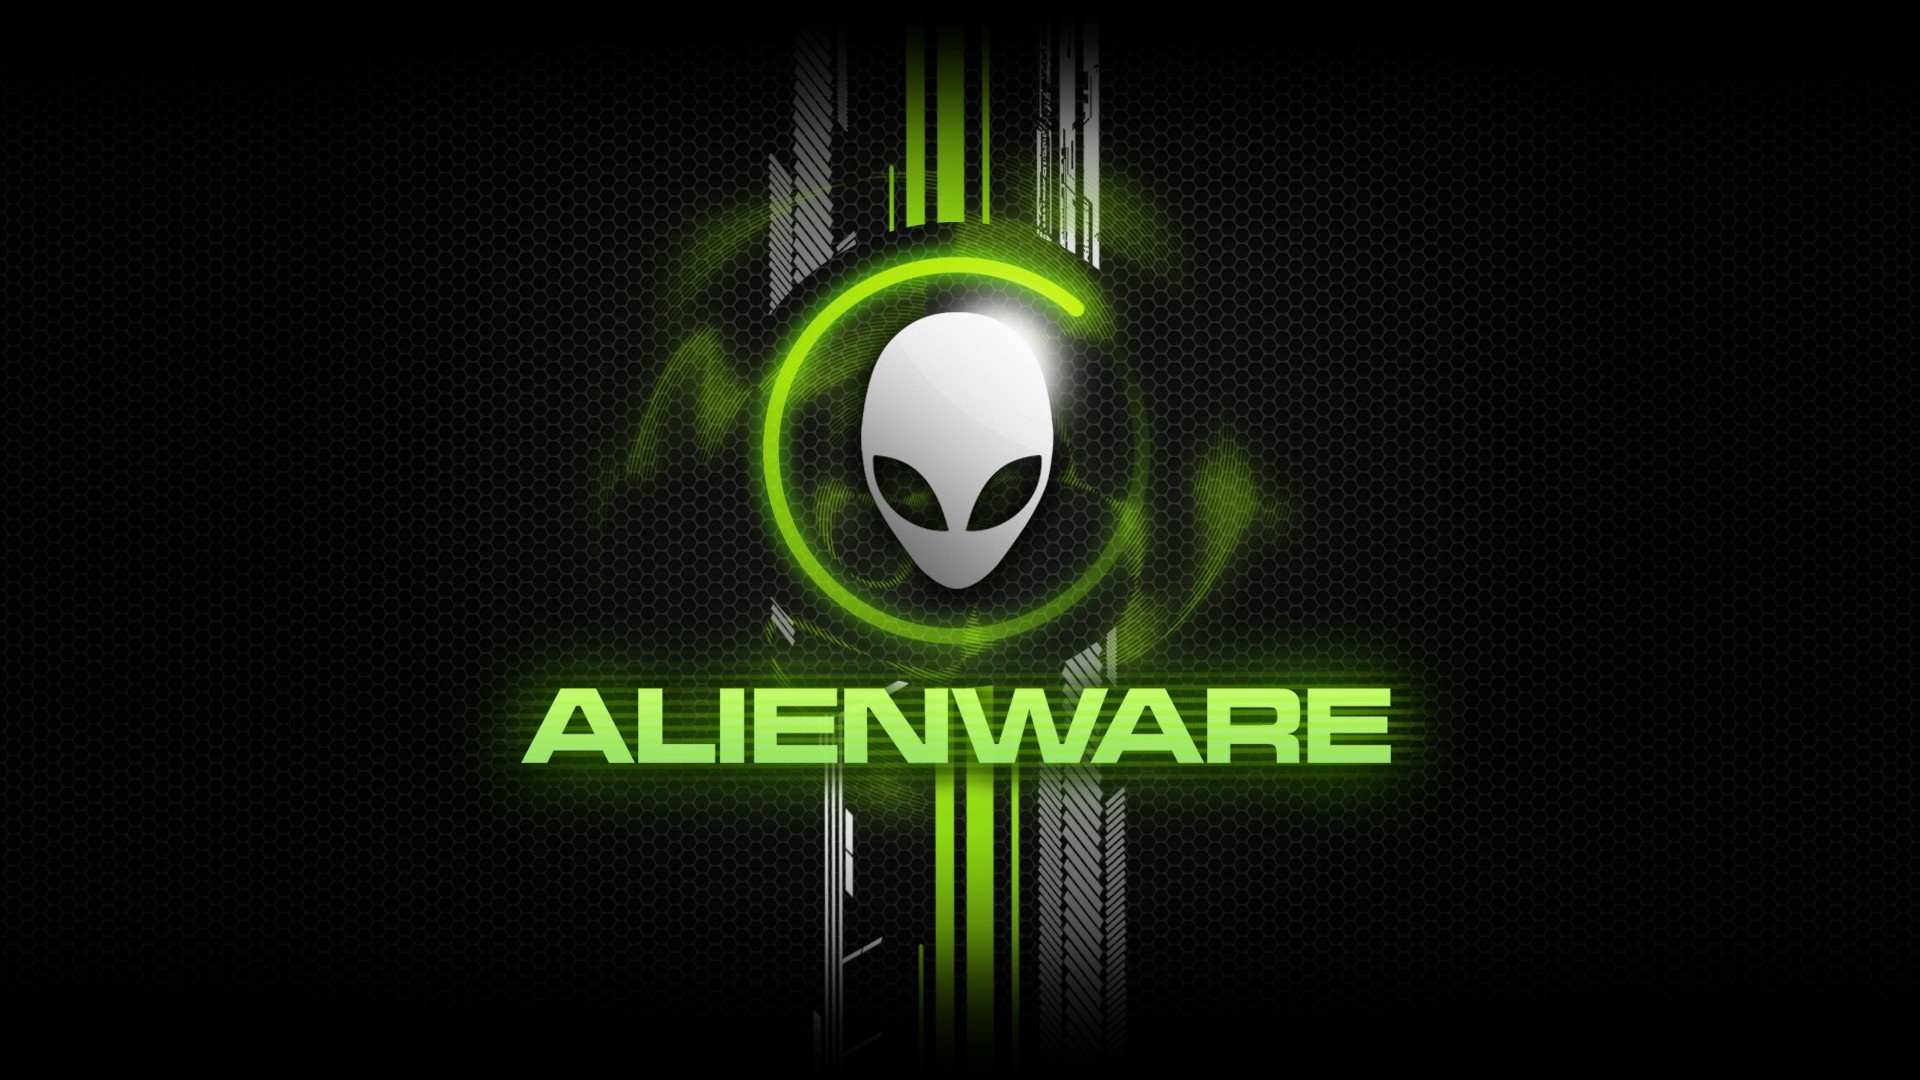 Alienware Wallpapers for Windows 7 - WallpaperSafari